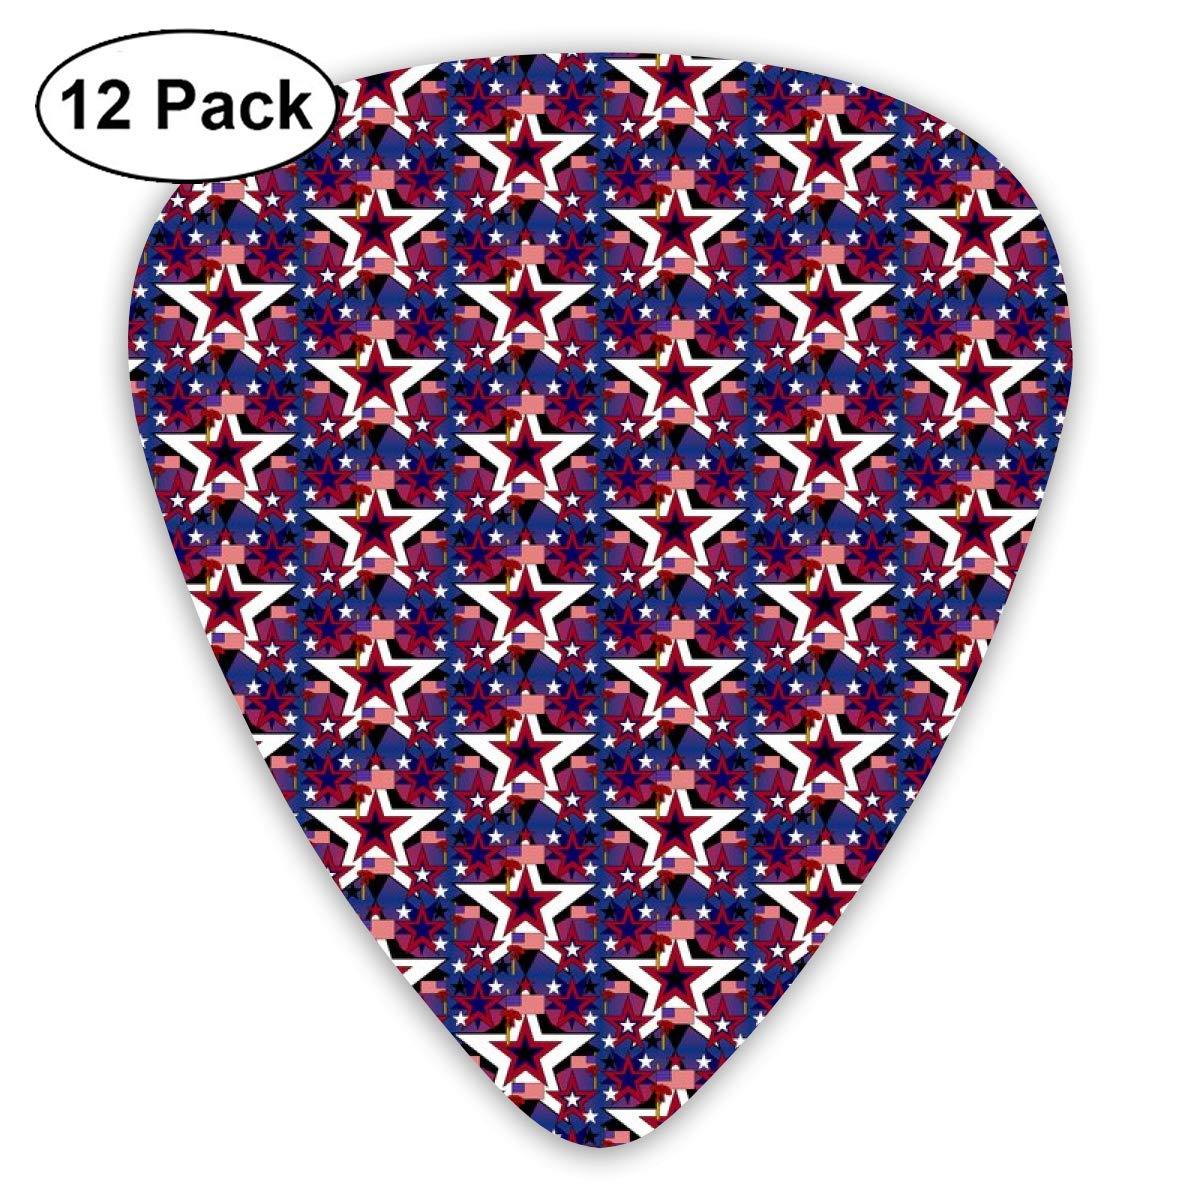 Primitive patriotic heart clipart banner stock Amazon.com: Patriotic Primitive Americana, 4th Of July, And ... banner stock